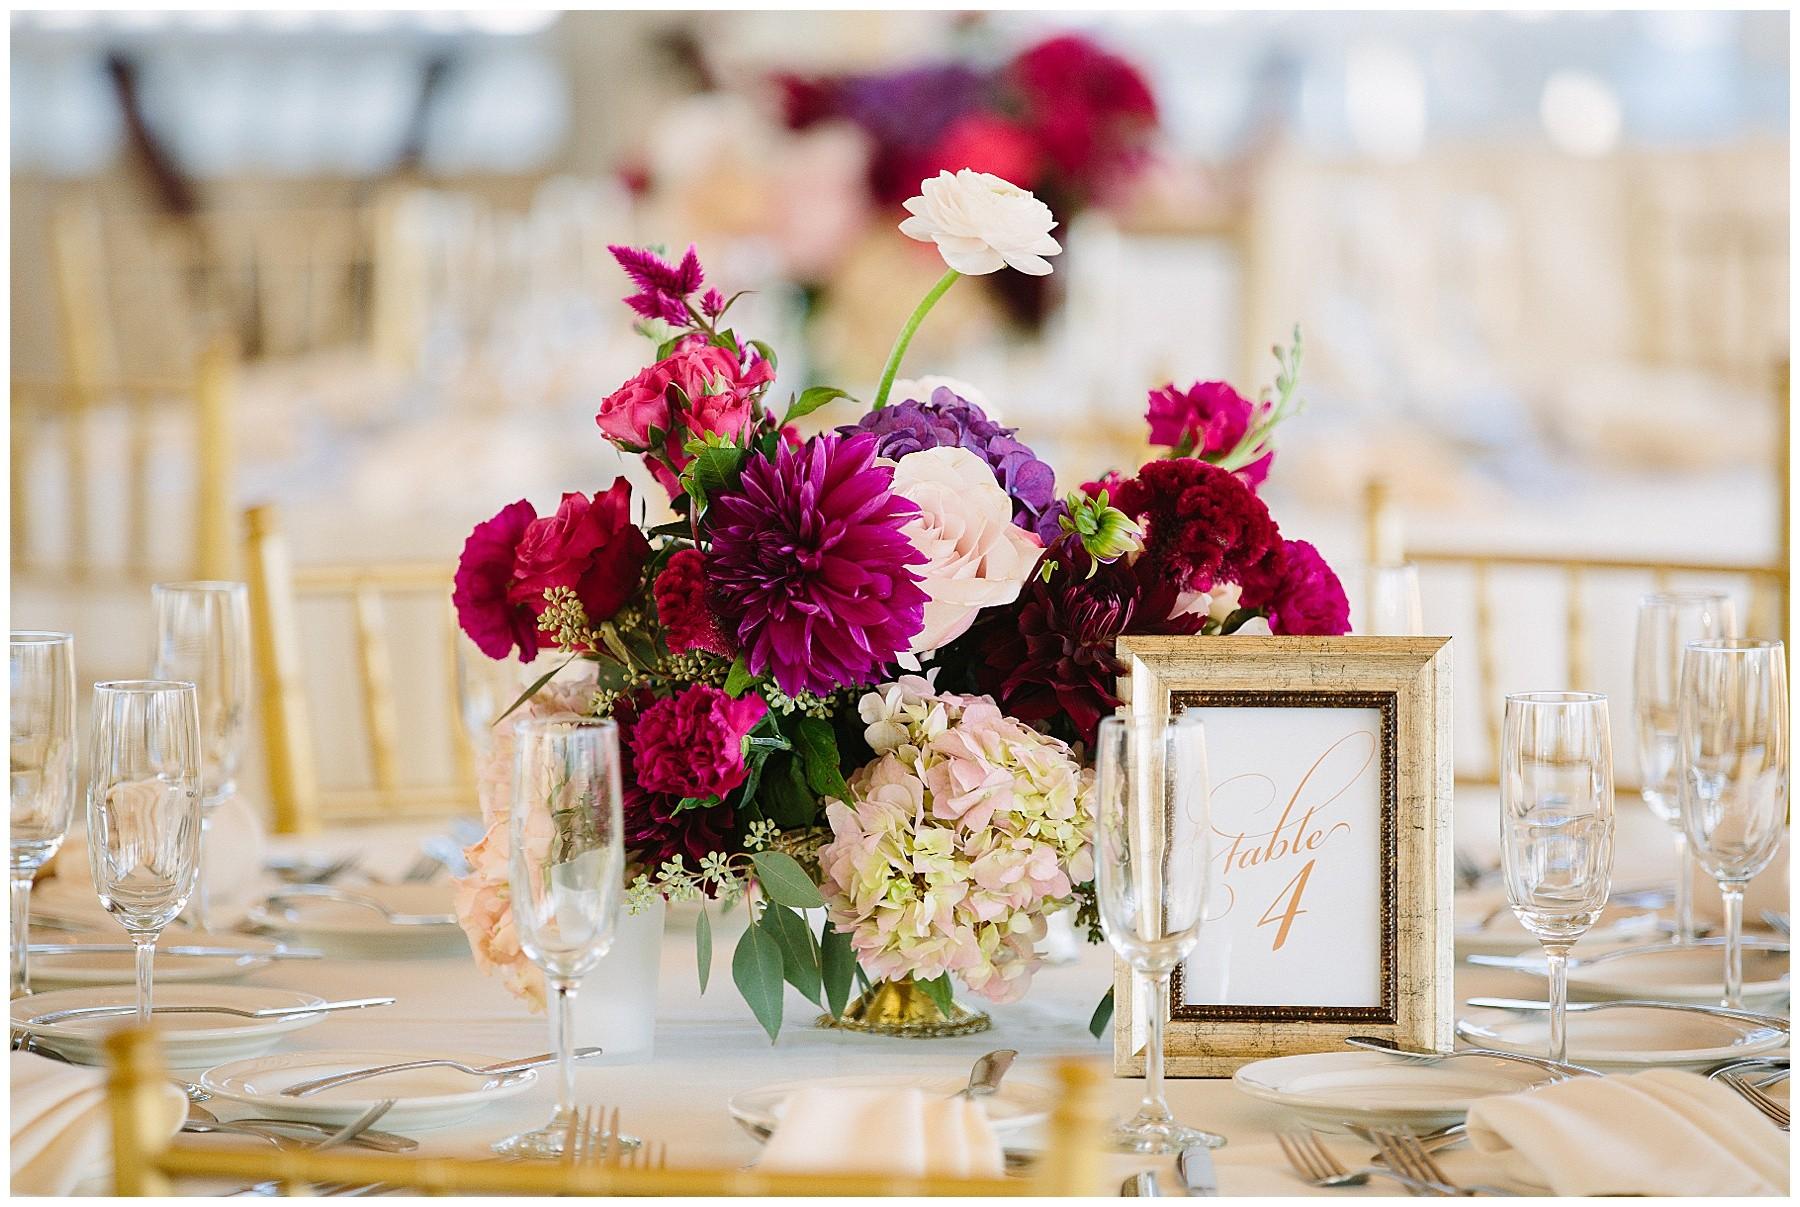 Mike and Jessica's Regatta Place Wedding | Newport, Rhode